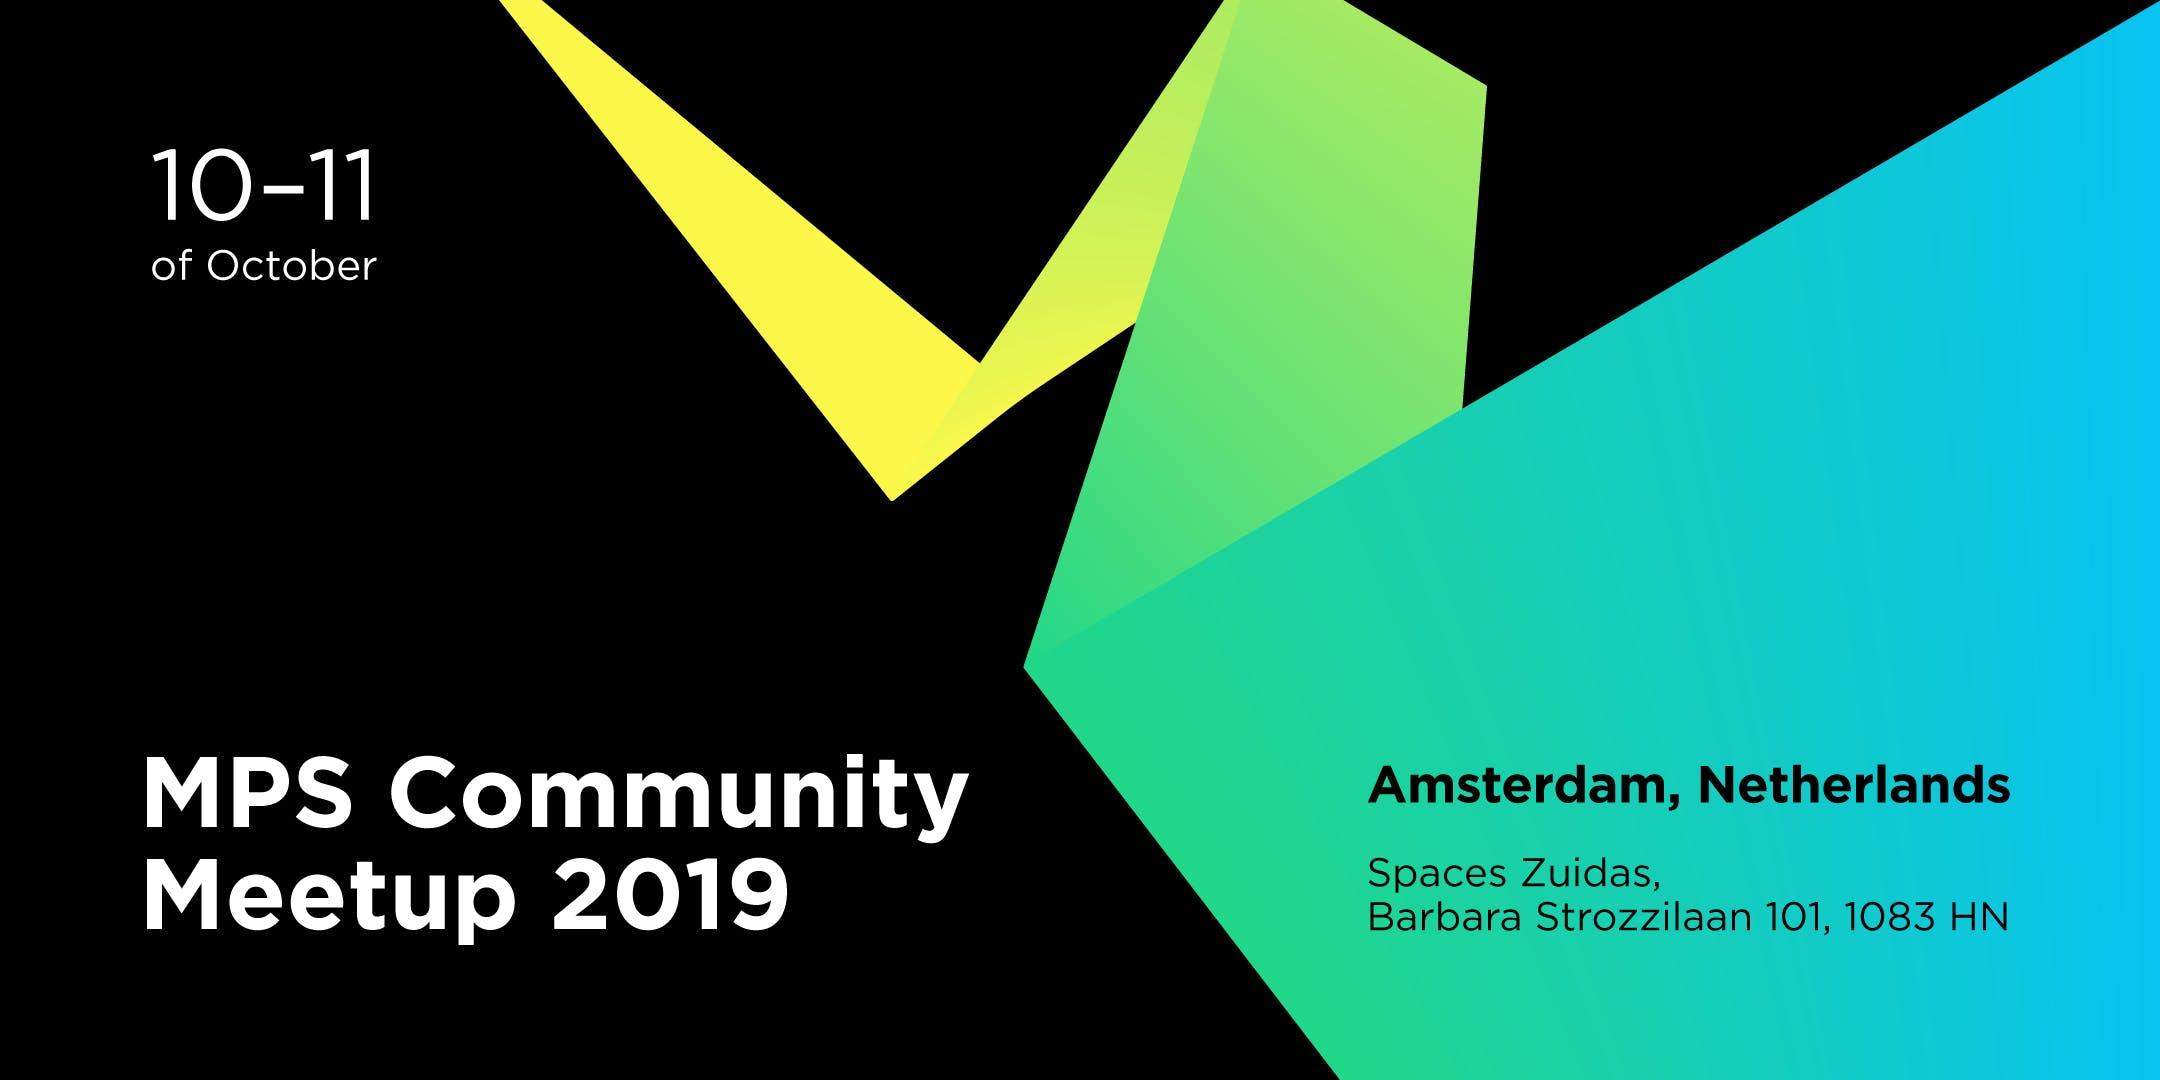 JetBrains MPS Community Meetup 2019